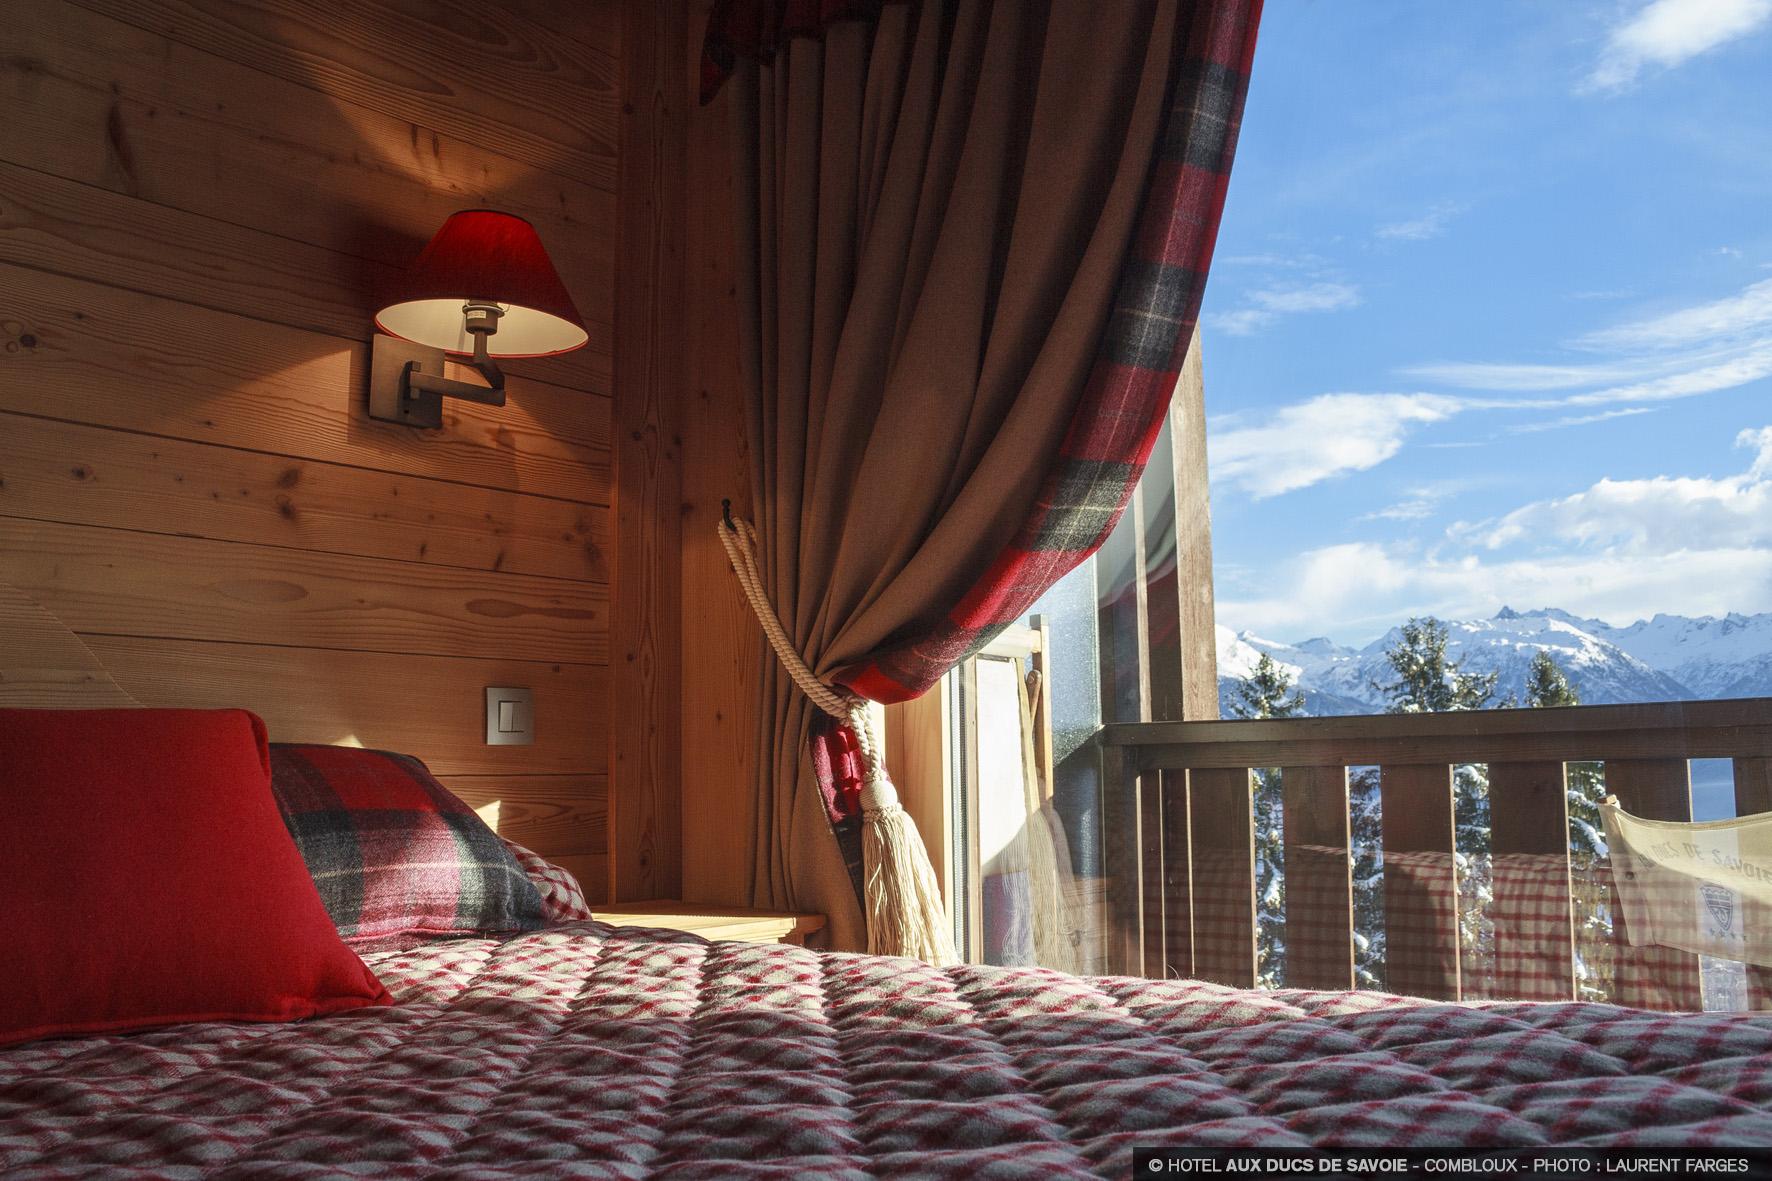 Les chambres/Bedrooms